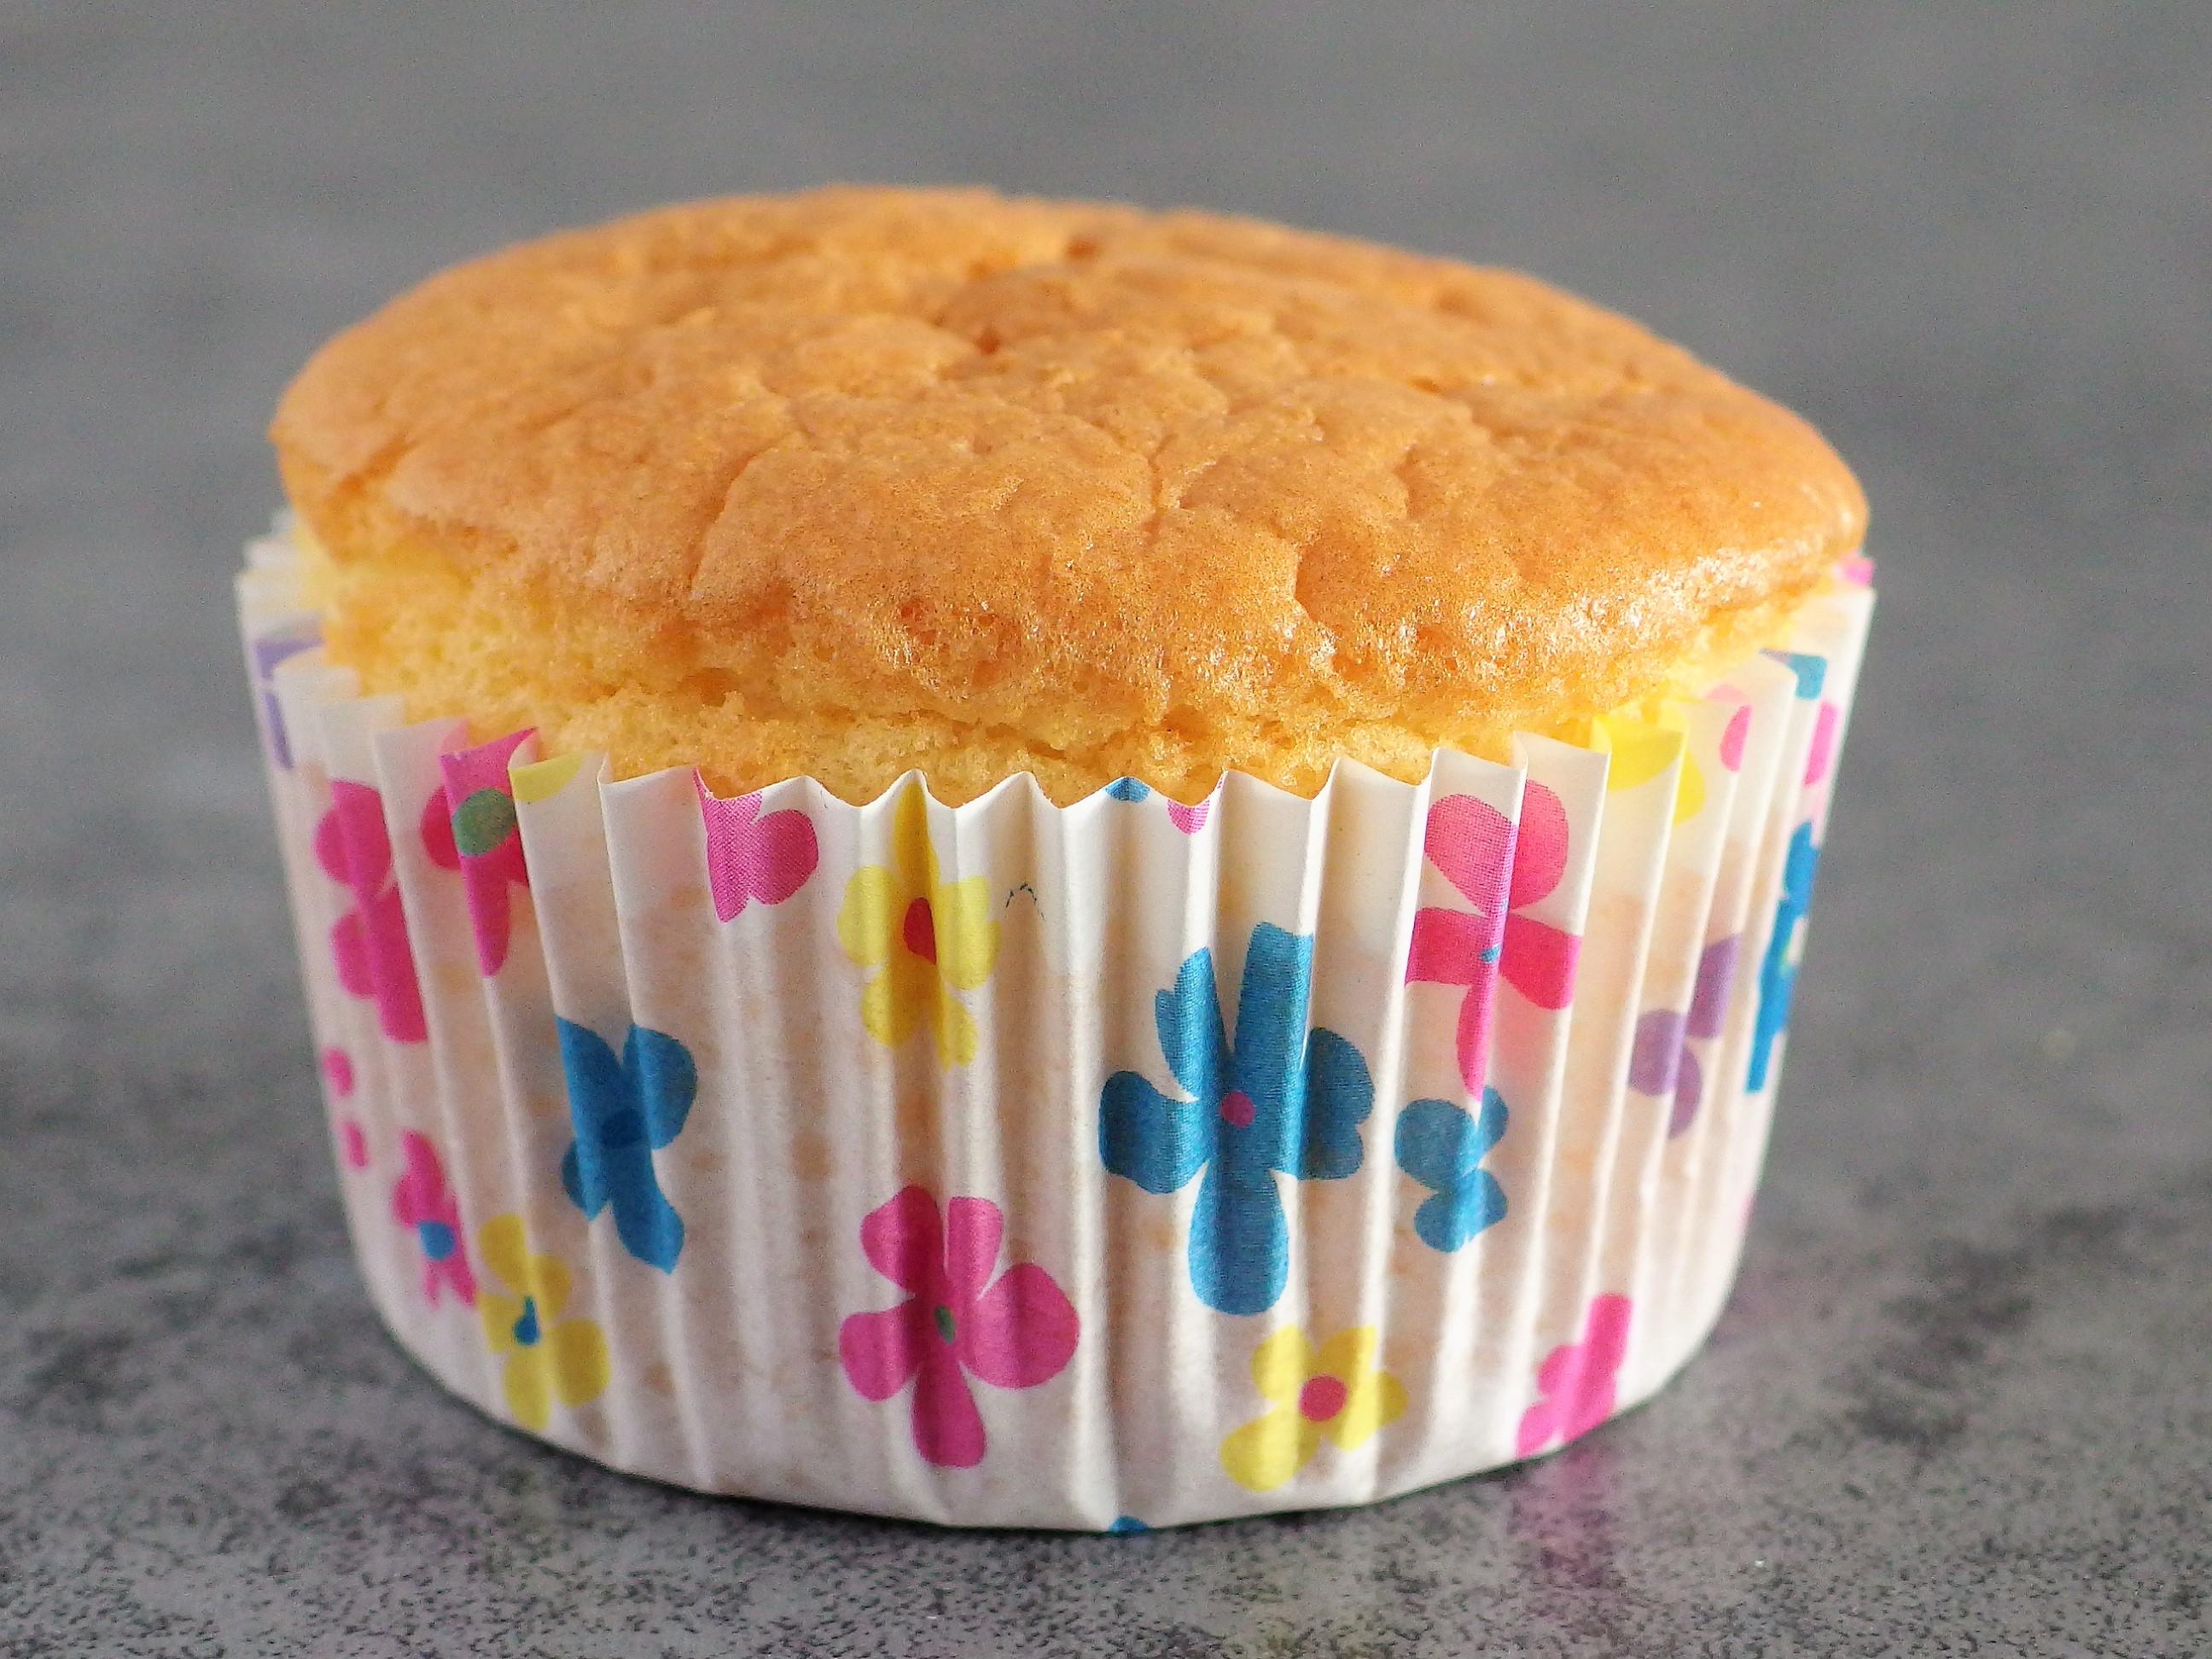 Egg Cake Recipe 鸡蛋糕